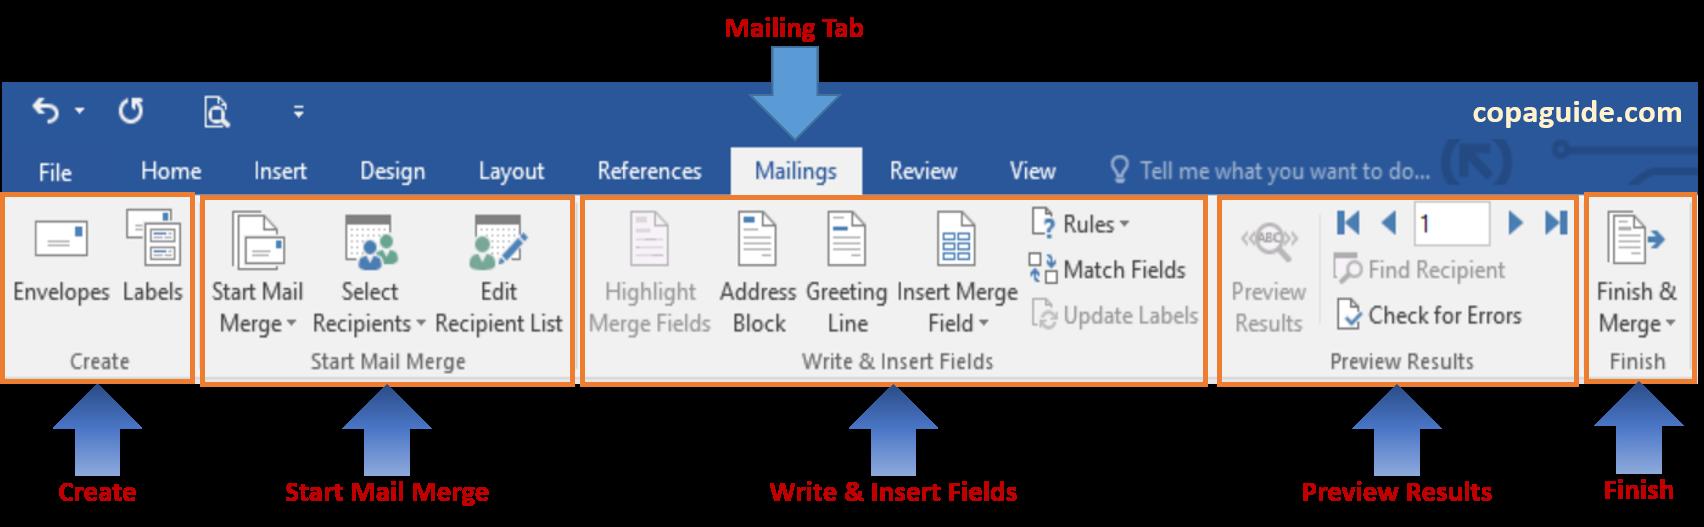 Microsoft Word - Using Mailing Tab